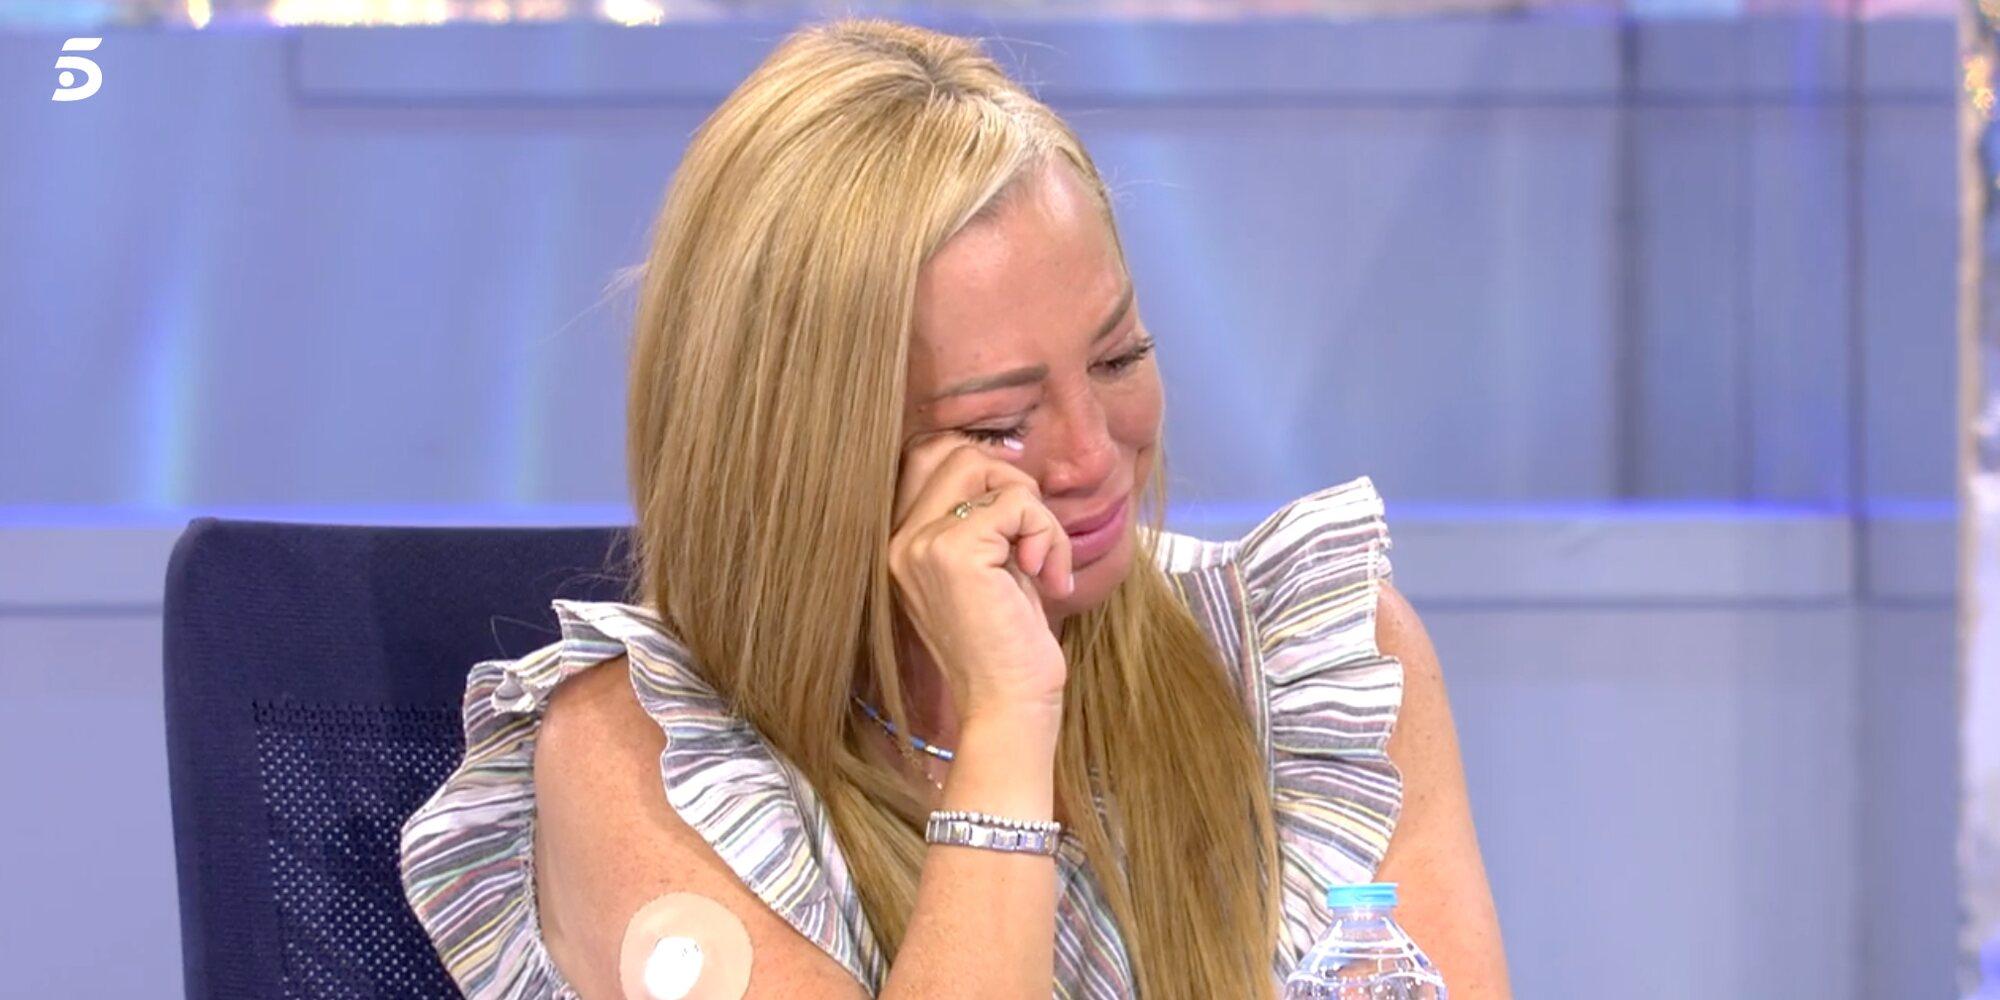 Belén Esteban y Kiko Hernández reciben en 'Sálvame' el regalo que Mila Ximénez les dejó antes de morir